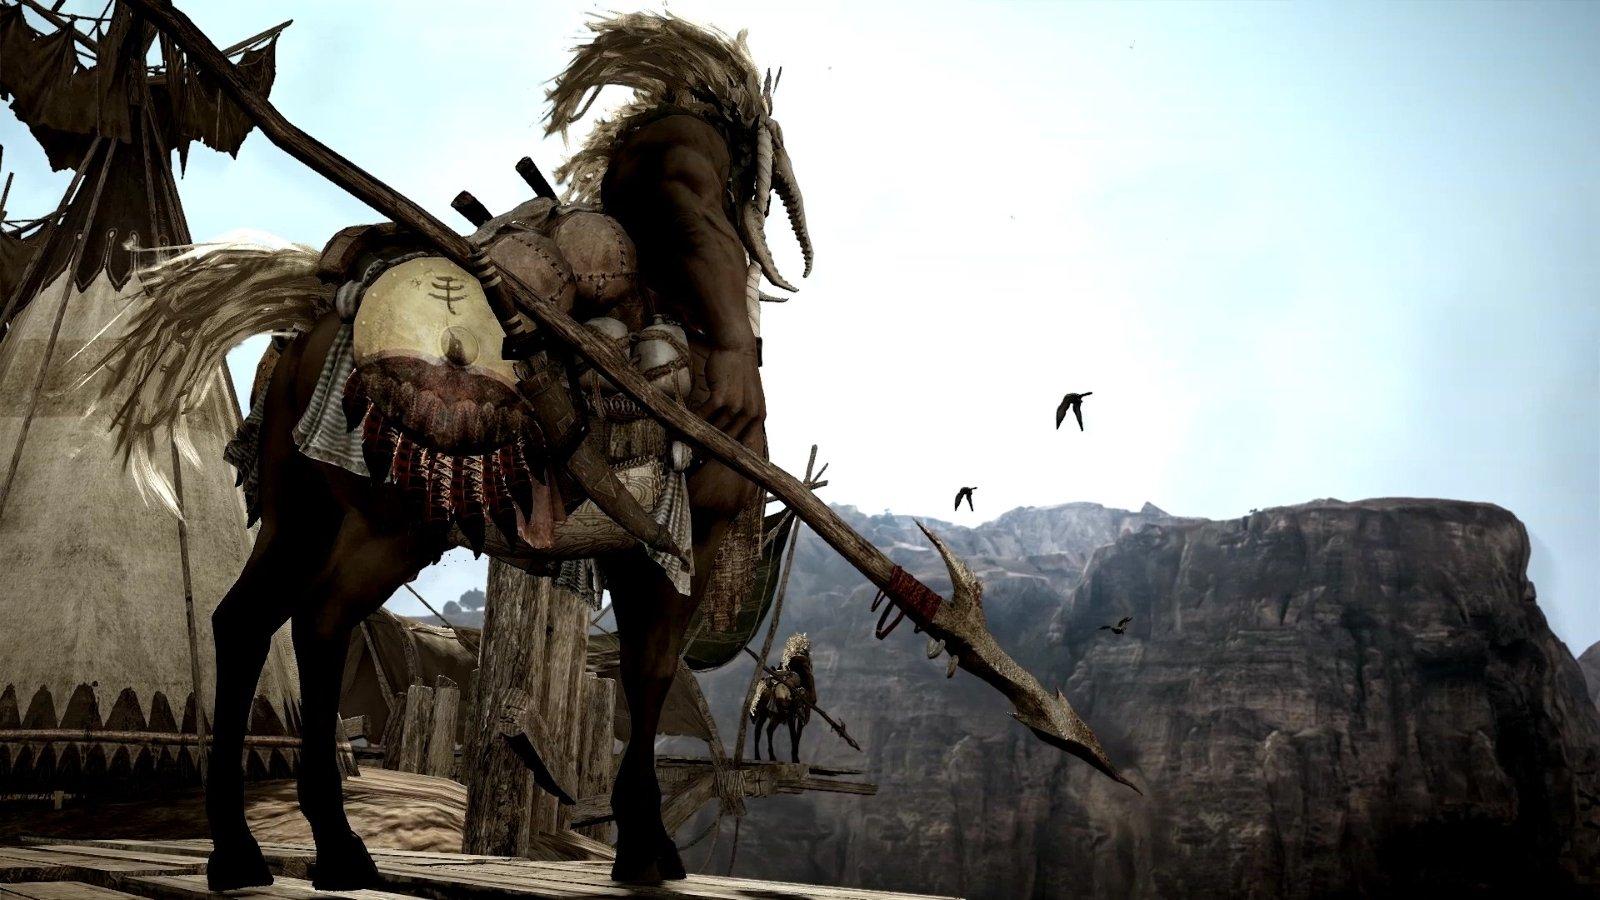 Black Desert Online Launching Valencia Expansion Part 1 in June